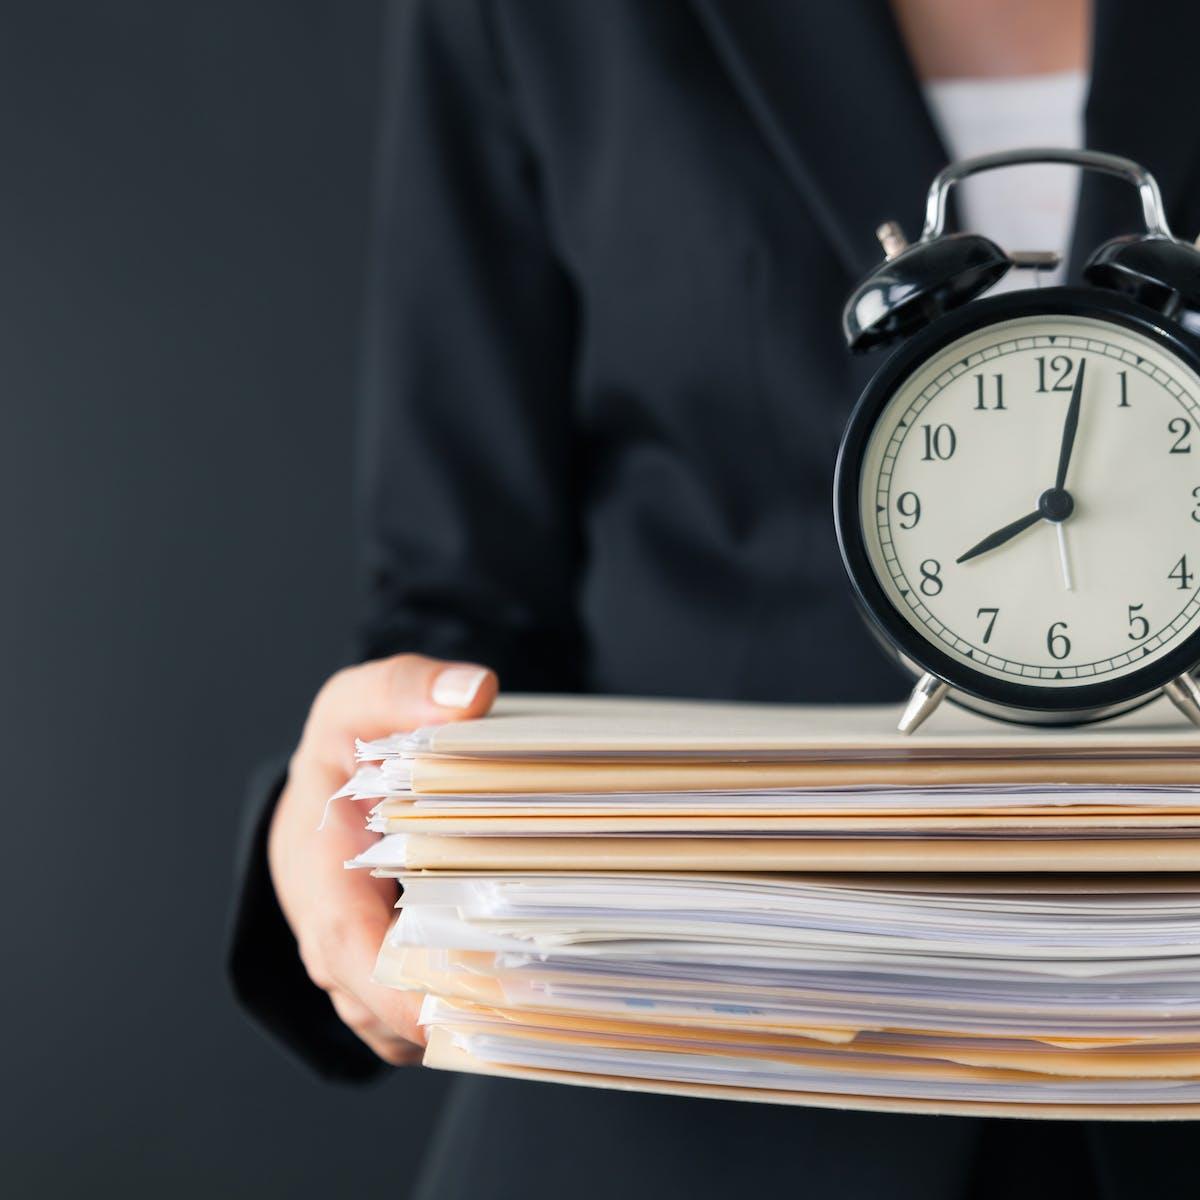 Titelbild-Arbeitszeit-flexibel-Wecker-Akten-Tarifvertrag-iStock-622925158-Sezeryadigar